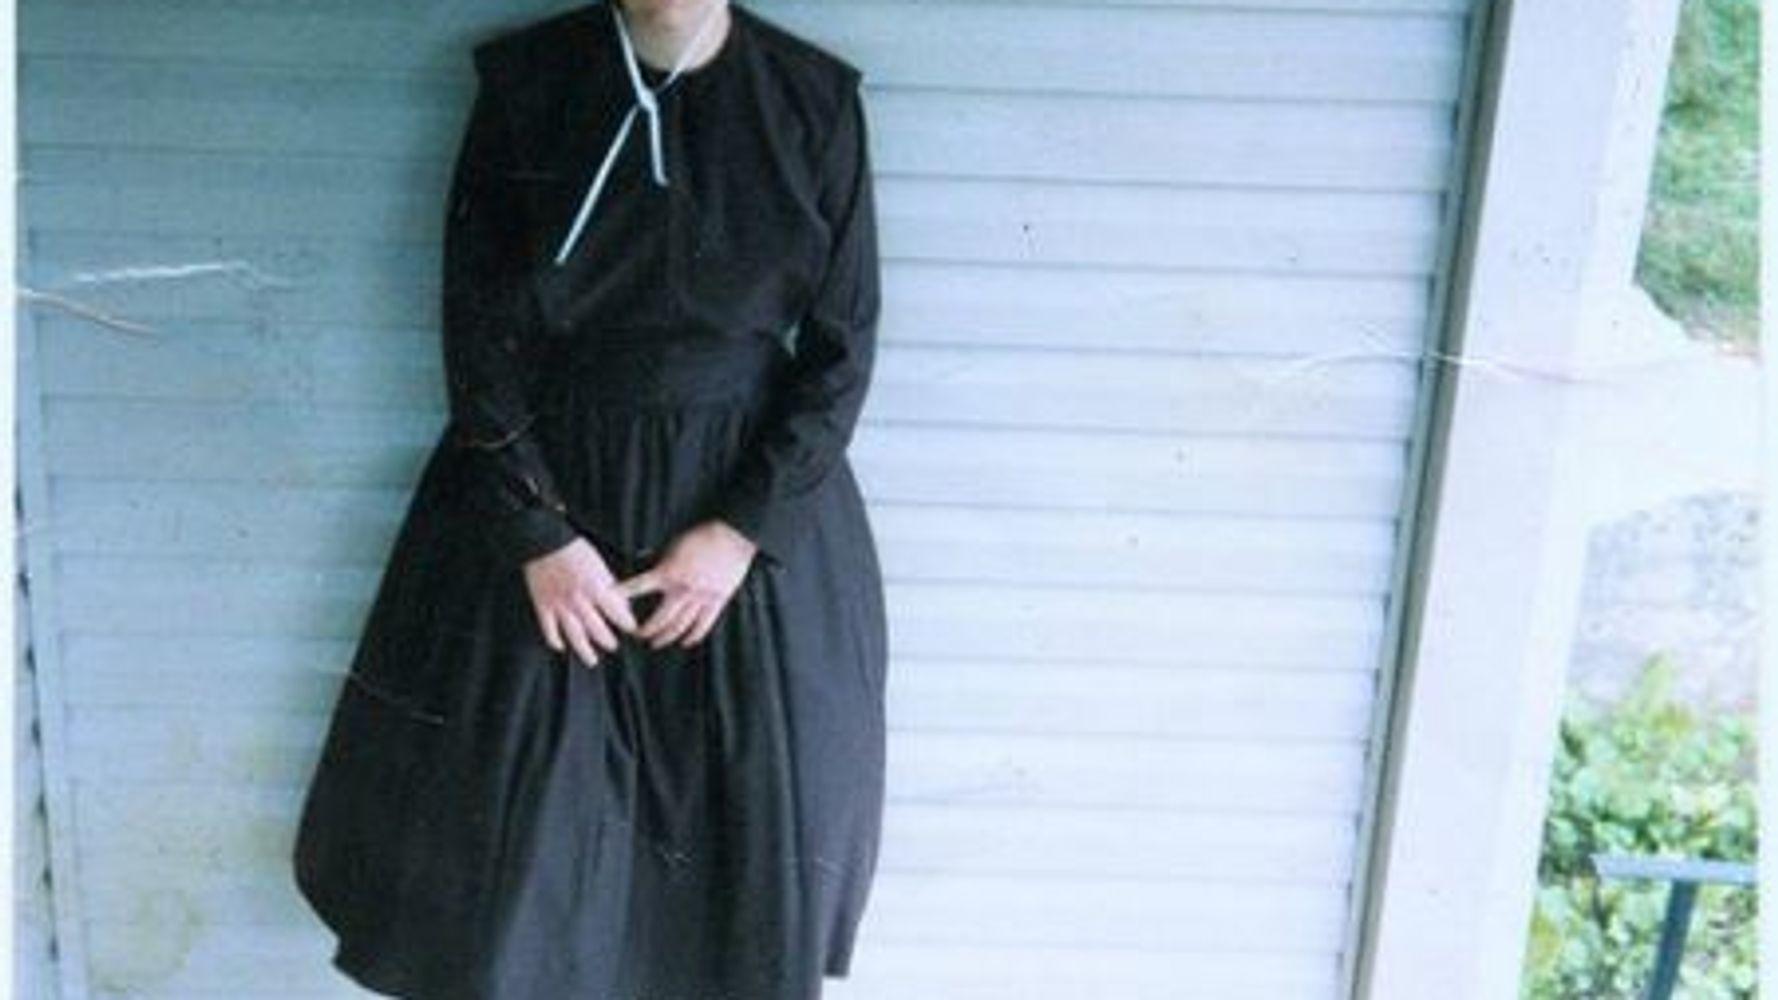 Survivor Speaks Out Against Amish Rape Culture Ahead Of